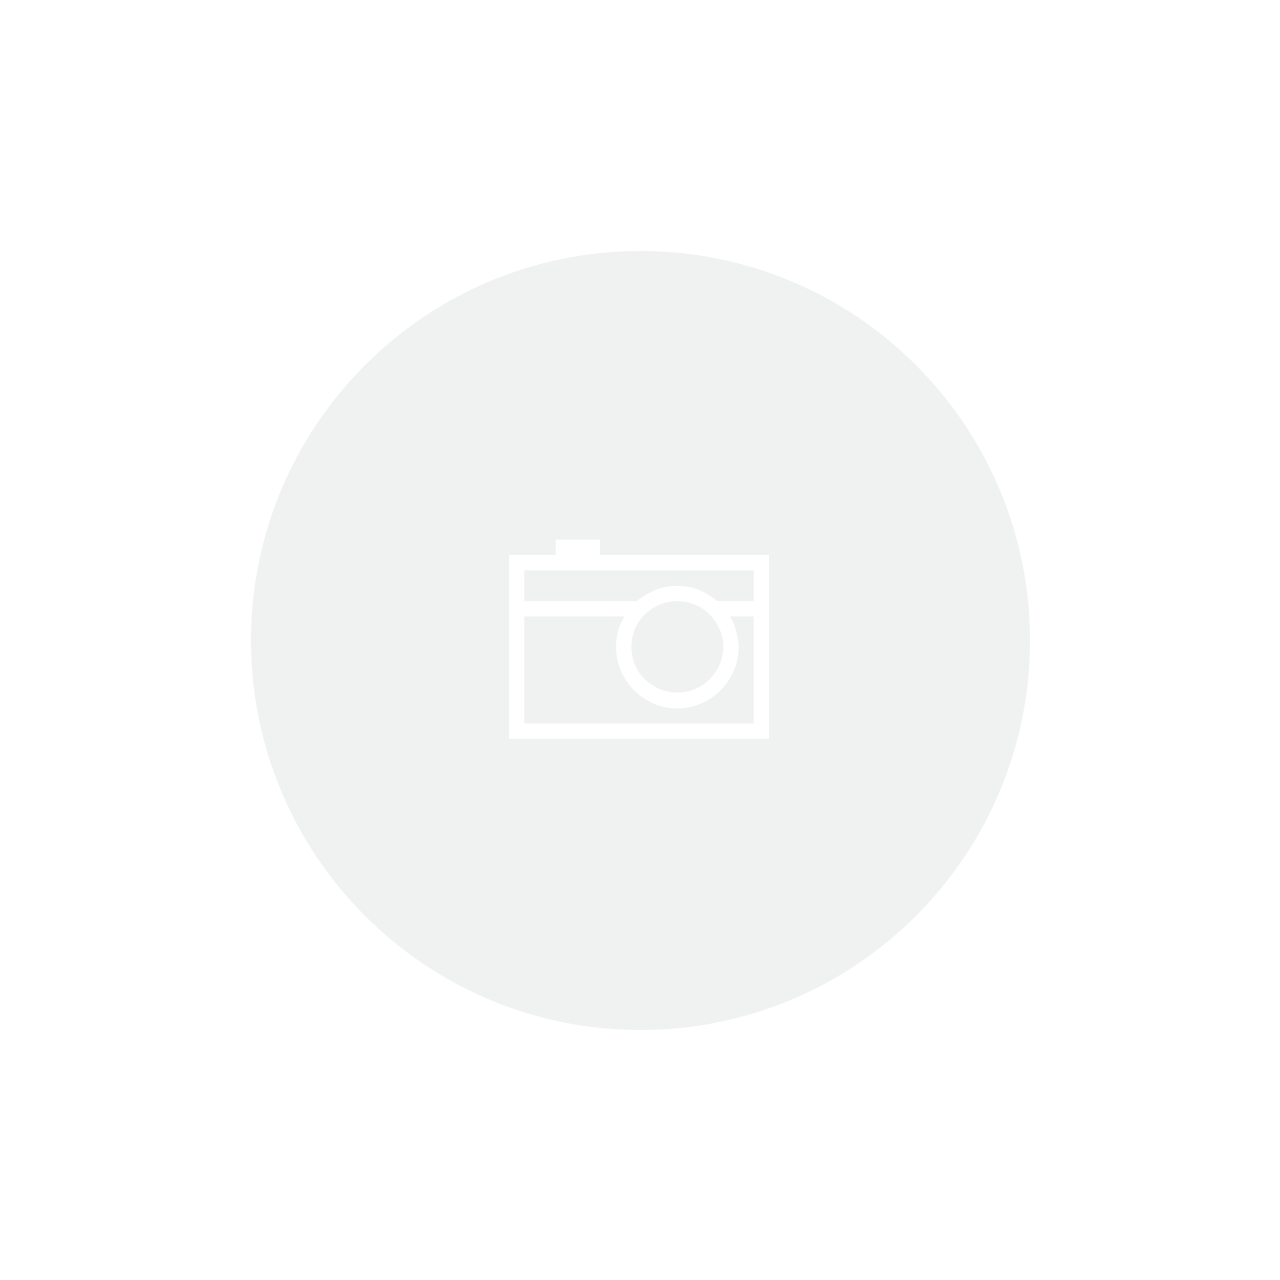 Papel Artesanal Indiano - Ref. 06